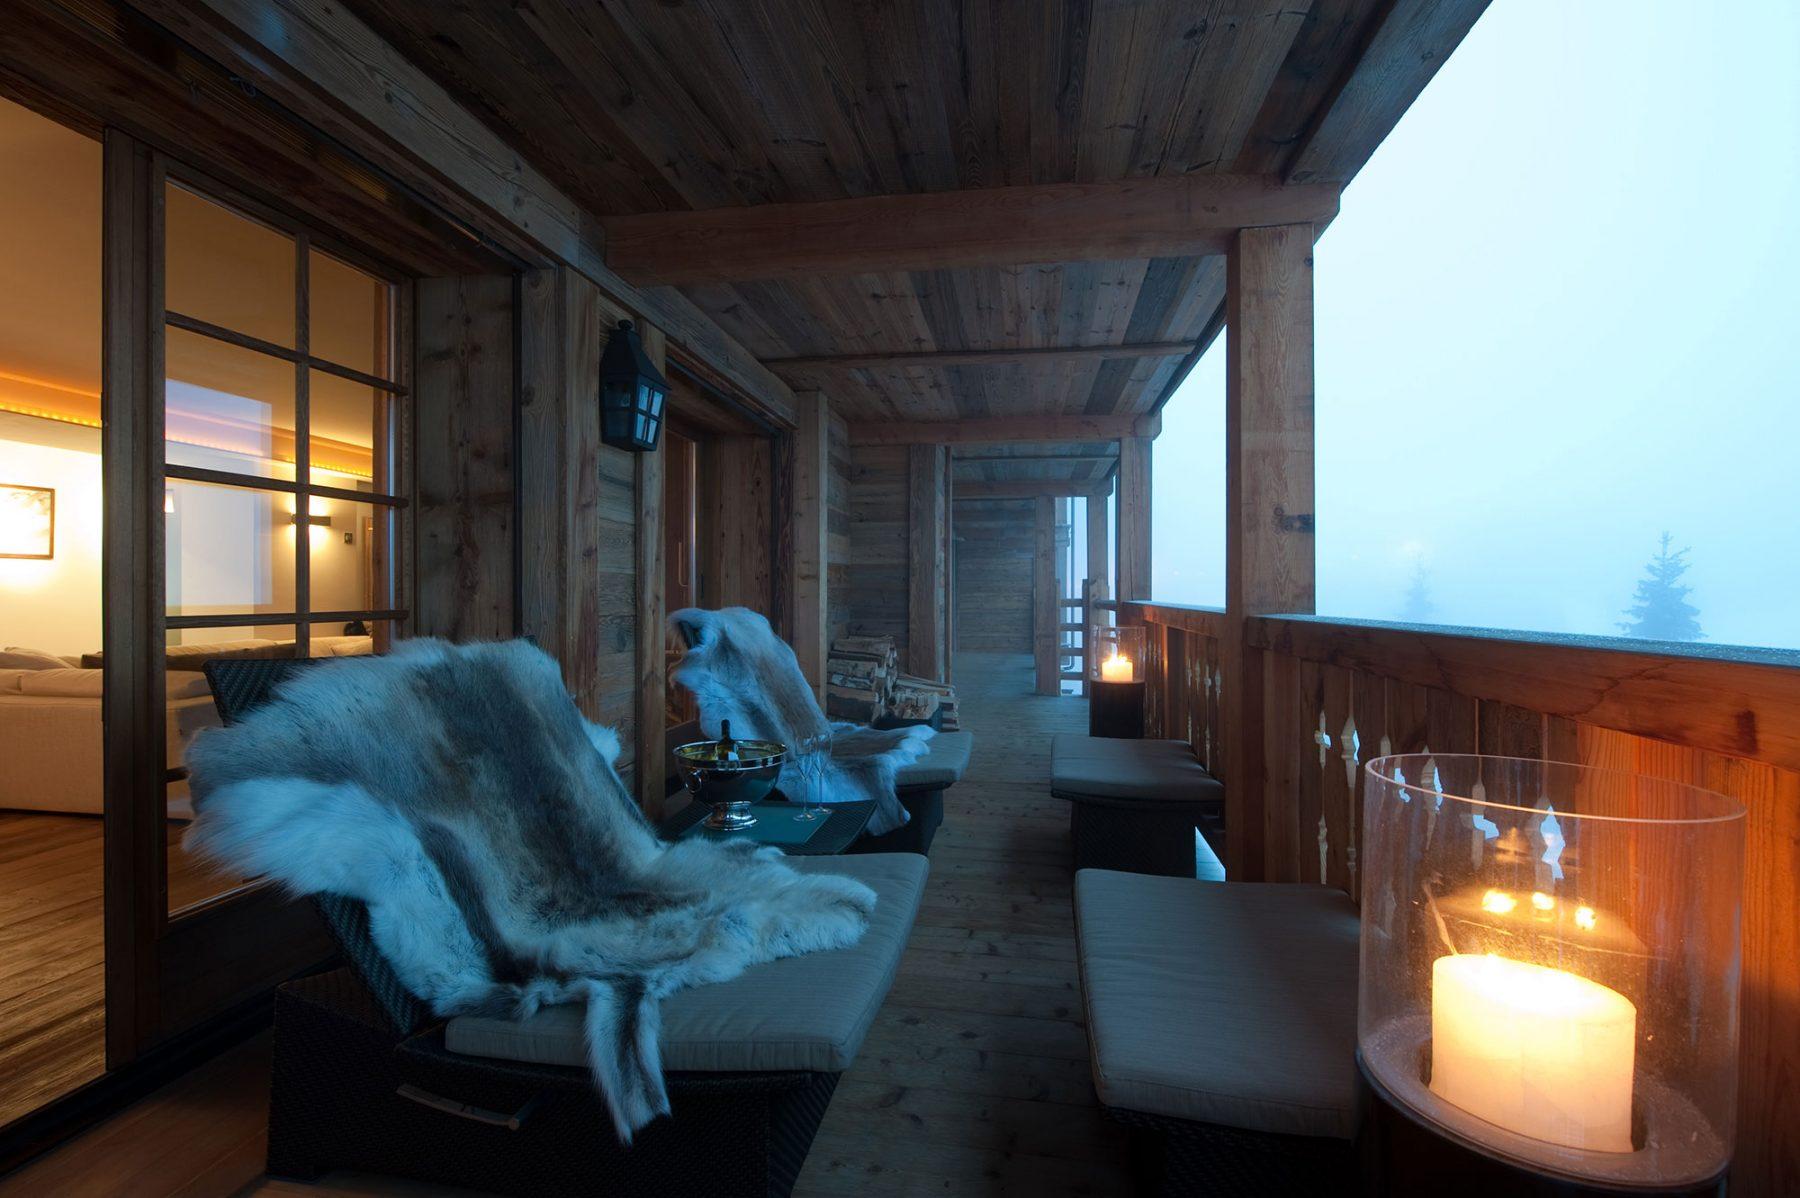 15-Terrace-at-night